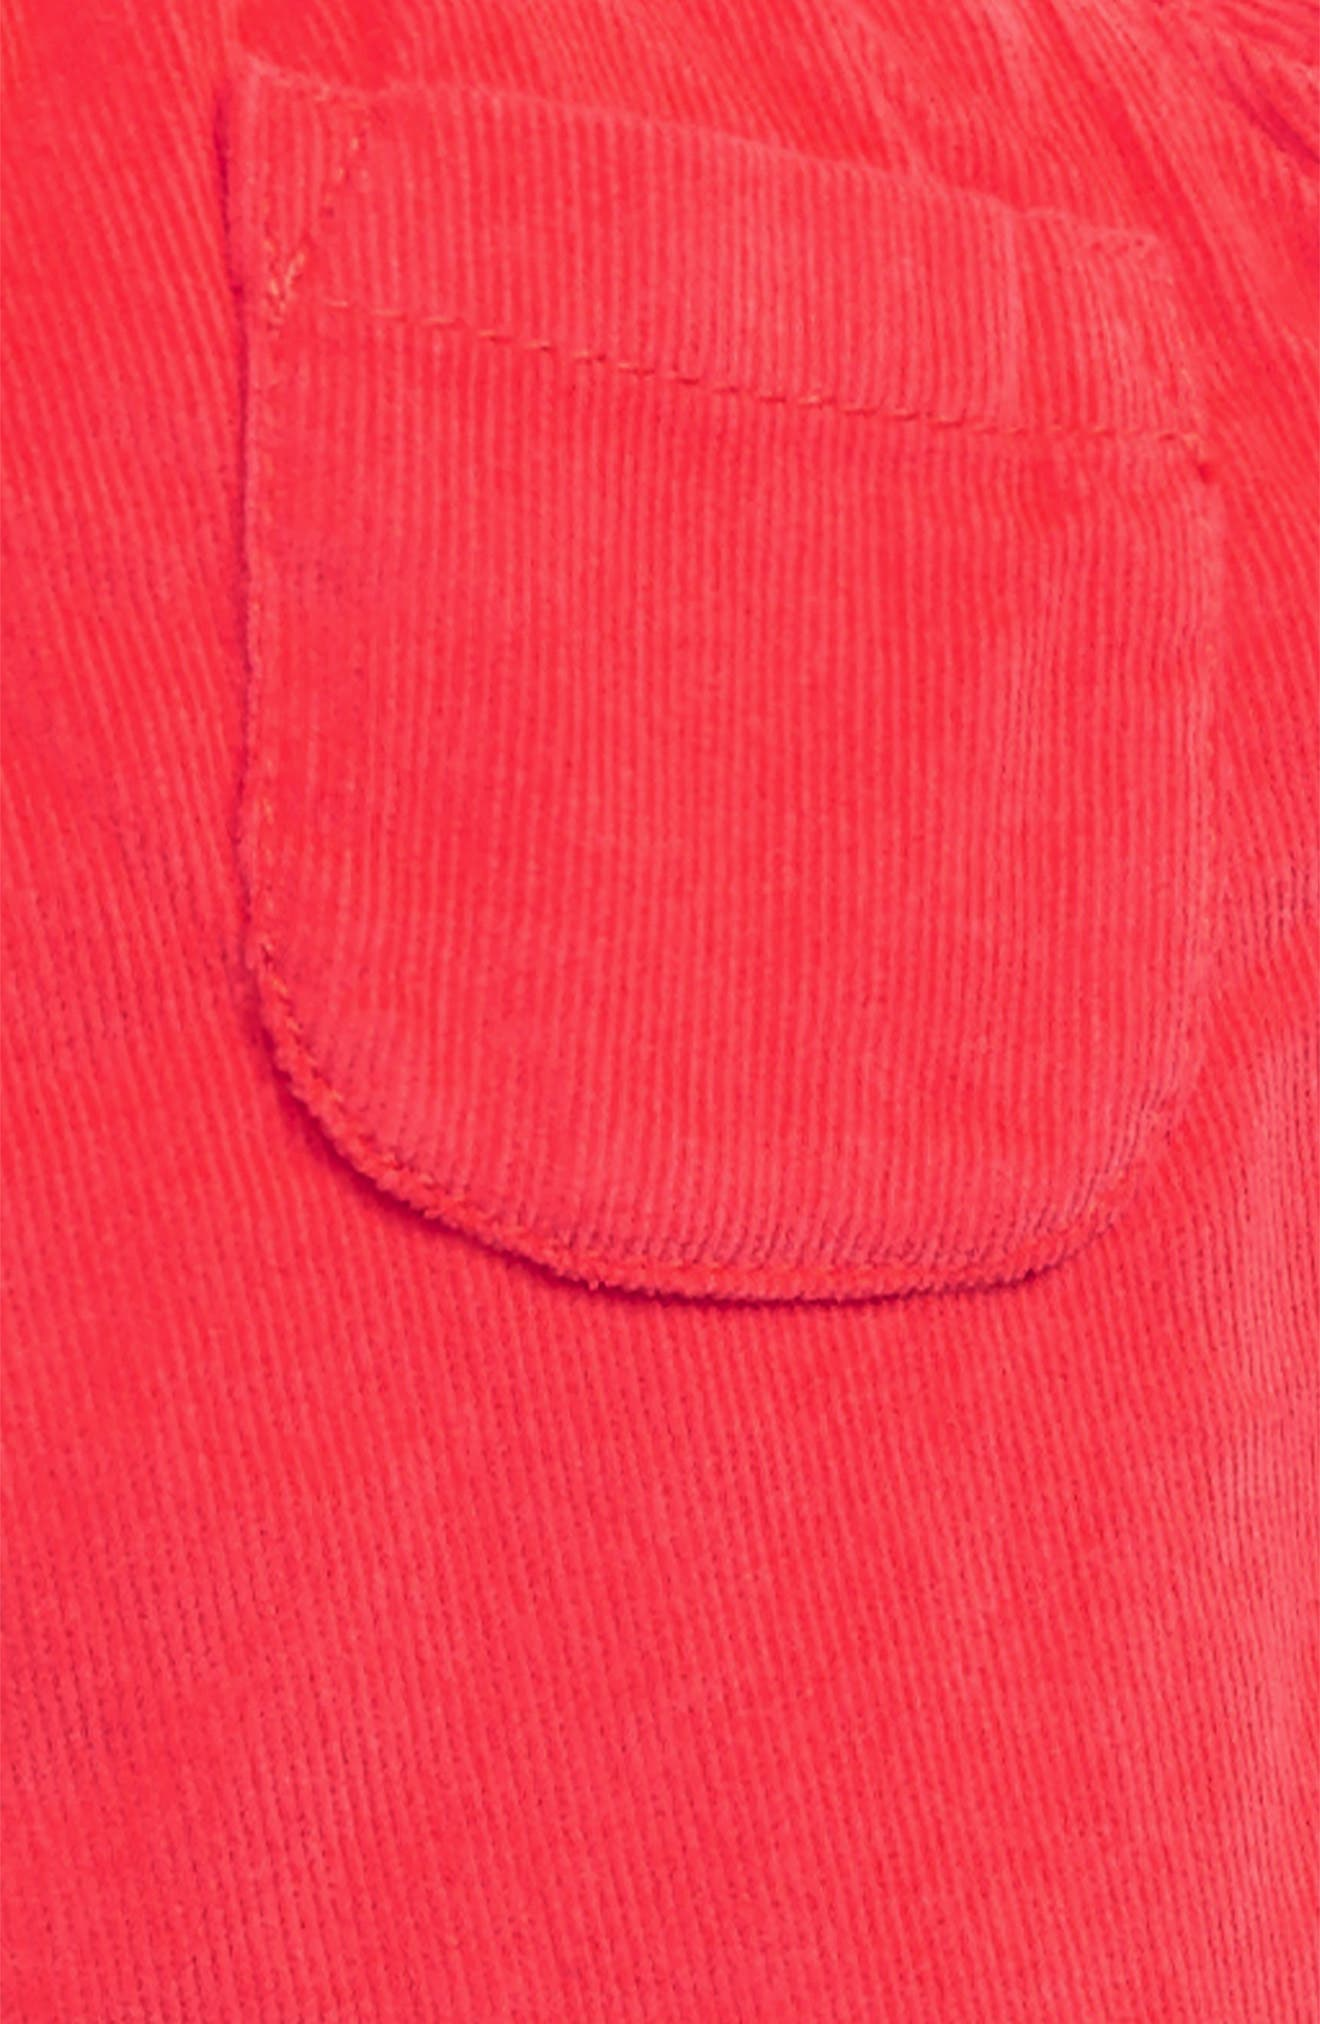 Corduroy Pants,                             Alternate thumbnail 6, color,